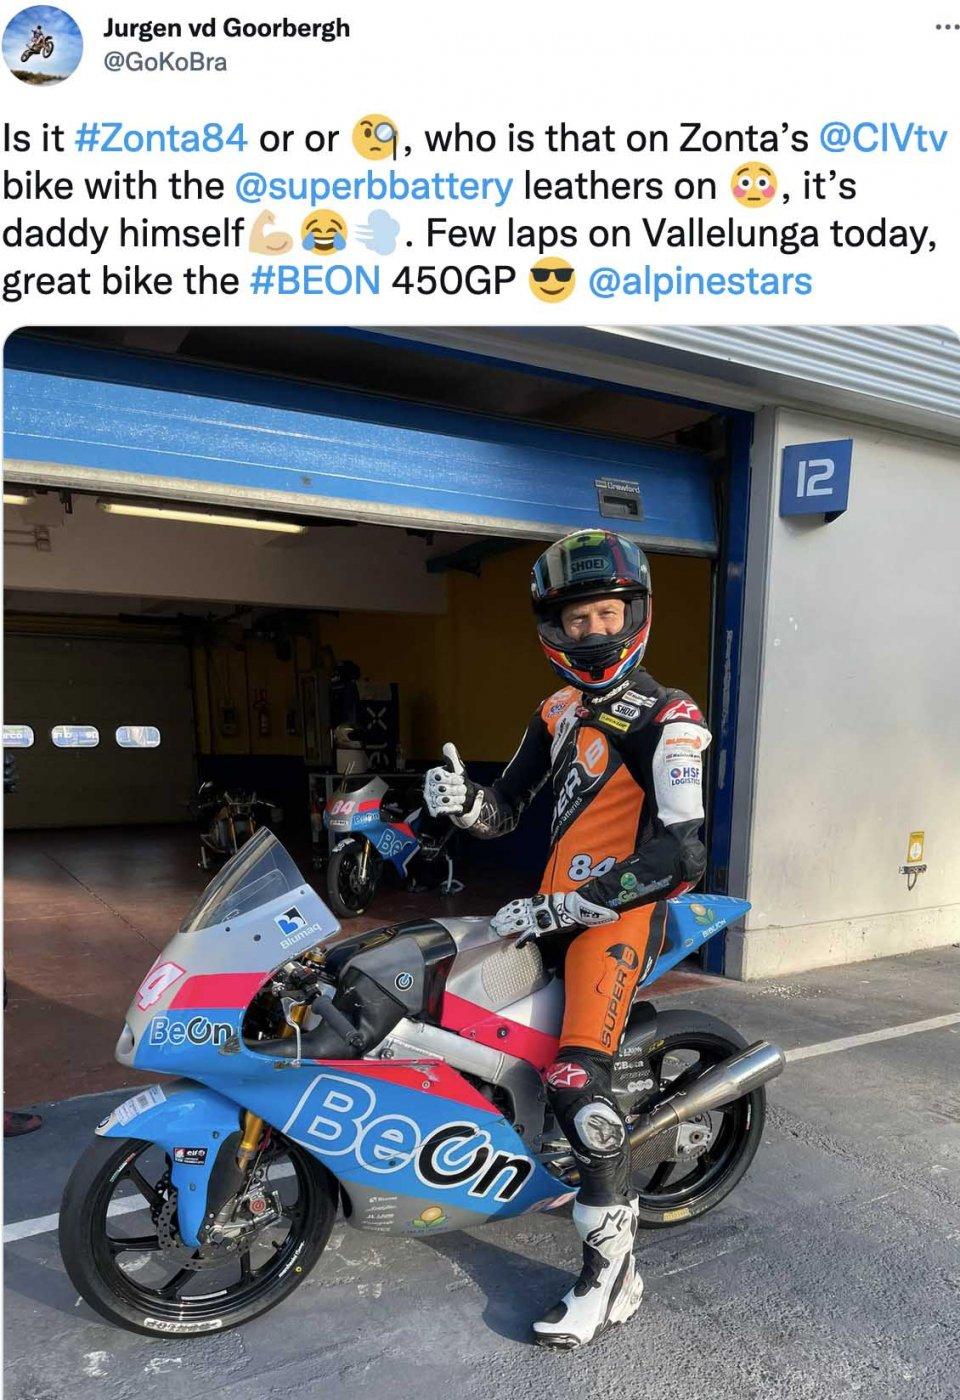 Moto3: Jurgen Van Den Goorbergh, at 52 years old riding the BeOn at Vallelunga